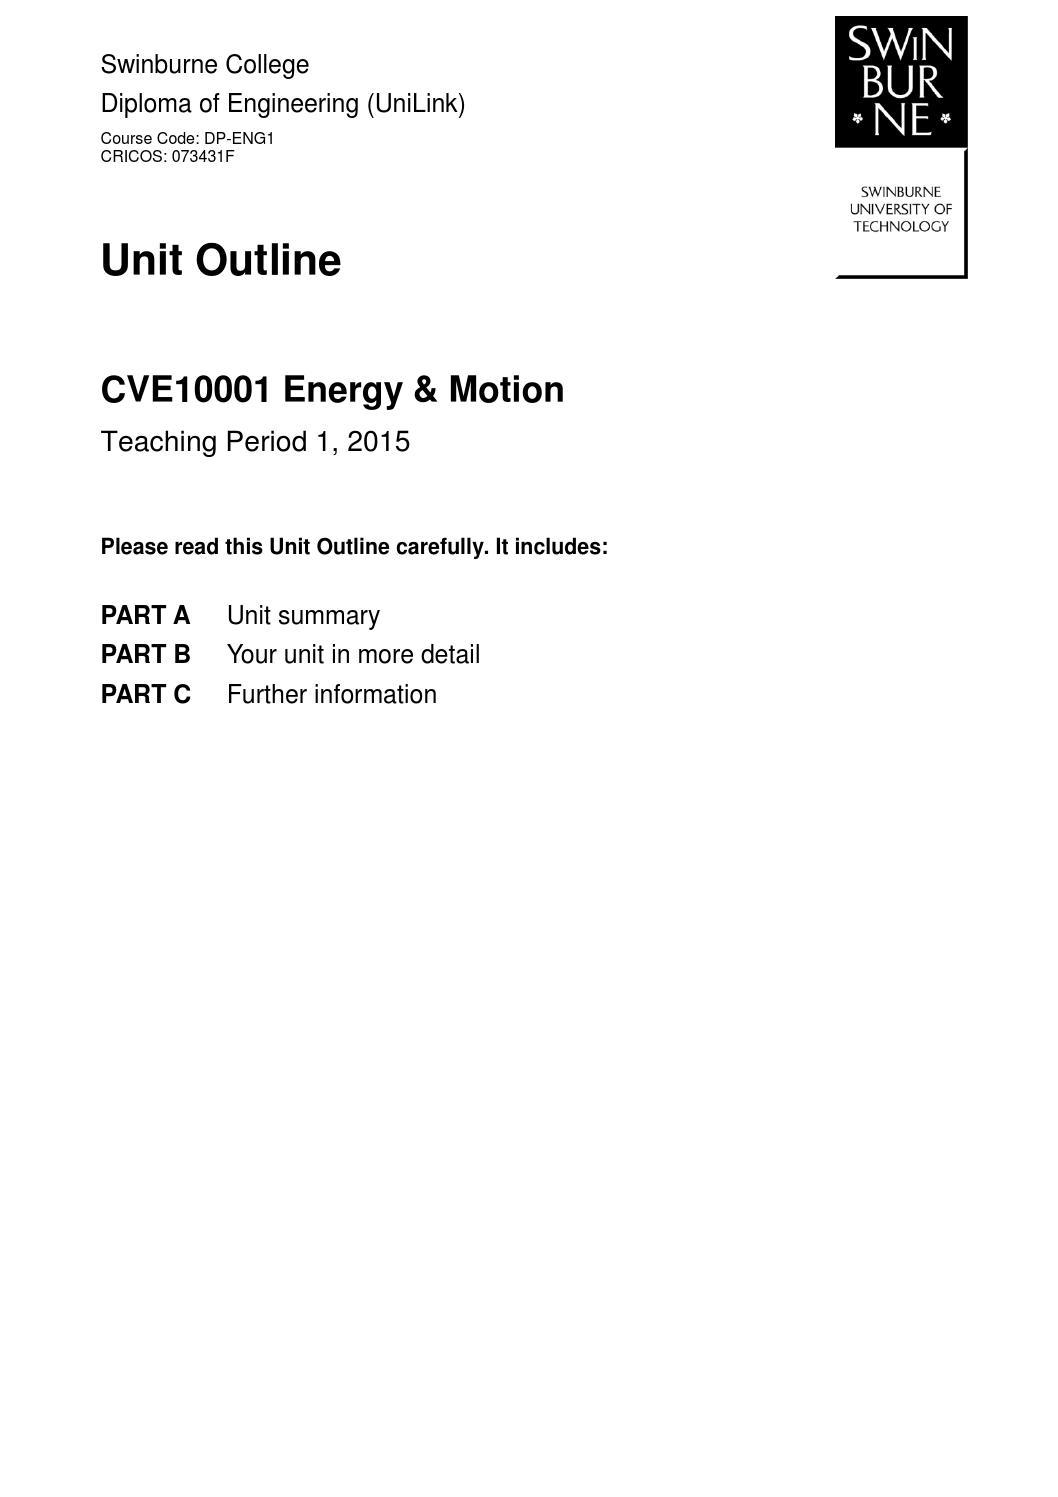 Uncategorized Potential Energy Worksheet worksheet kinetic and potential energy problems cve10001 unit outline tp1 2015 by carol aeschliman issuu